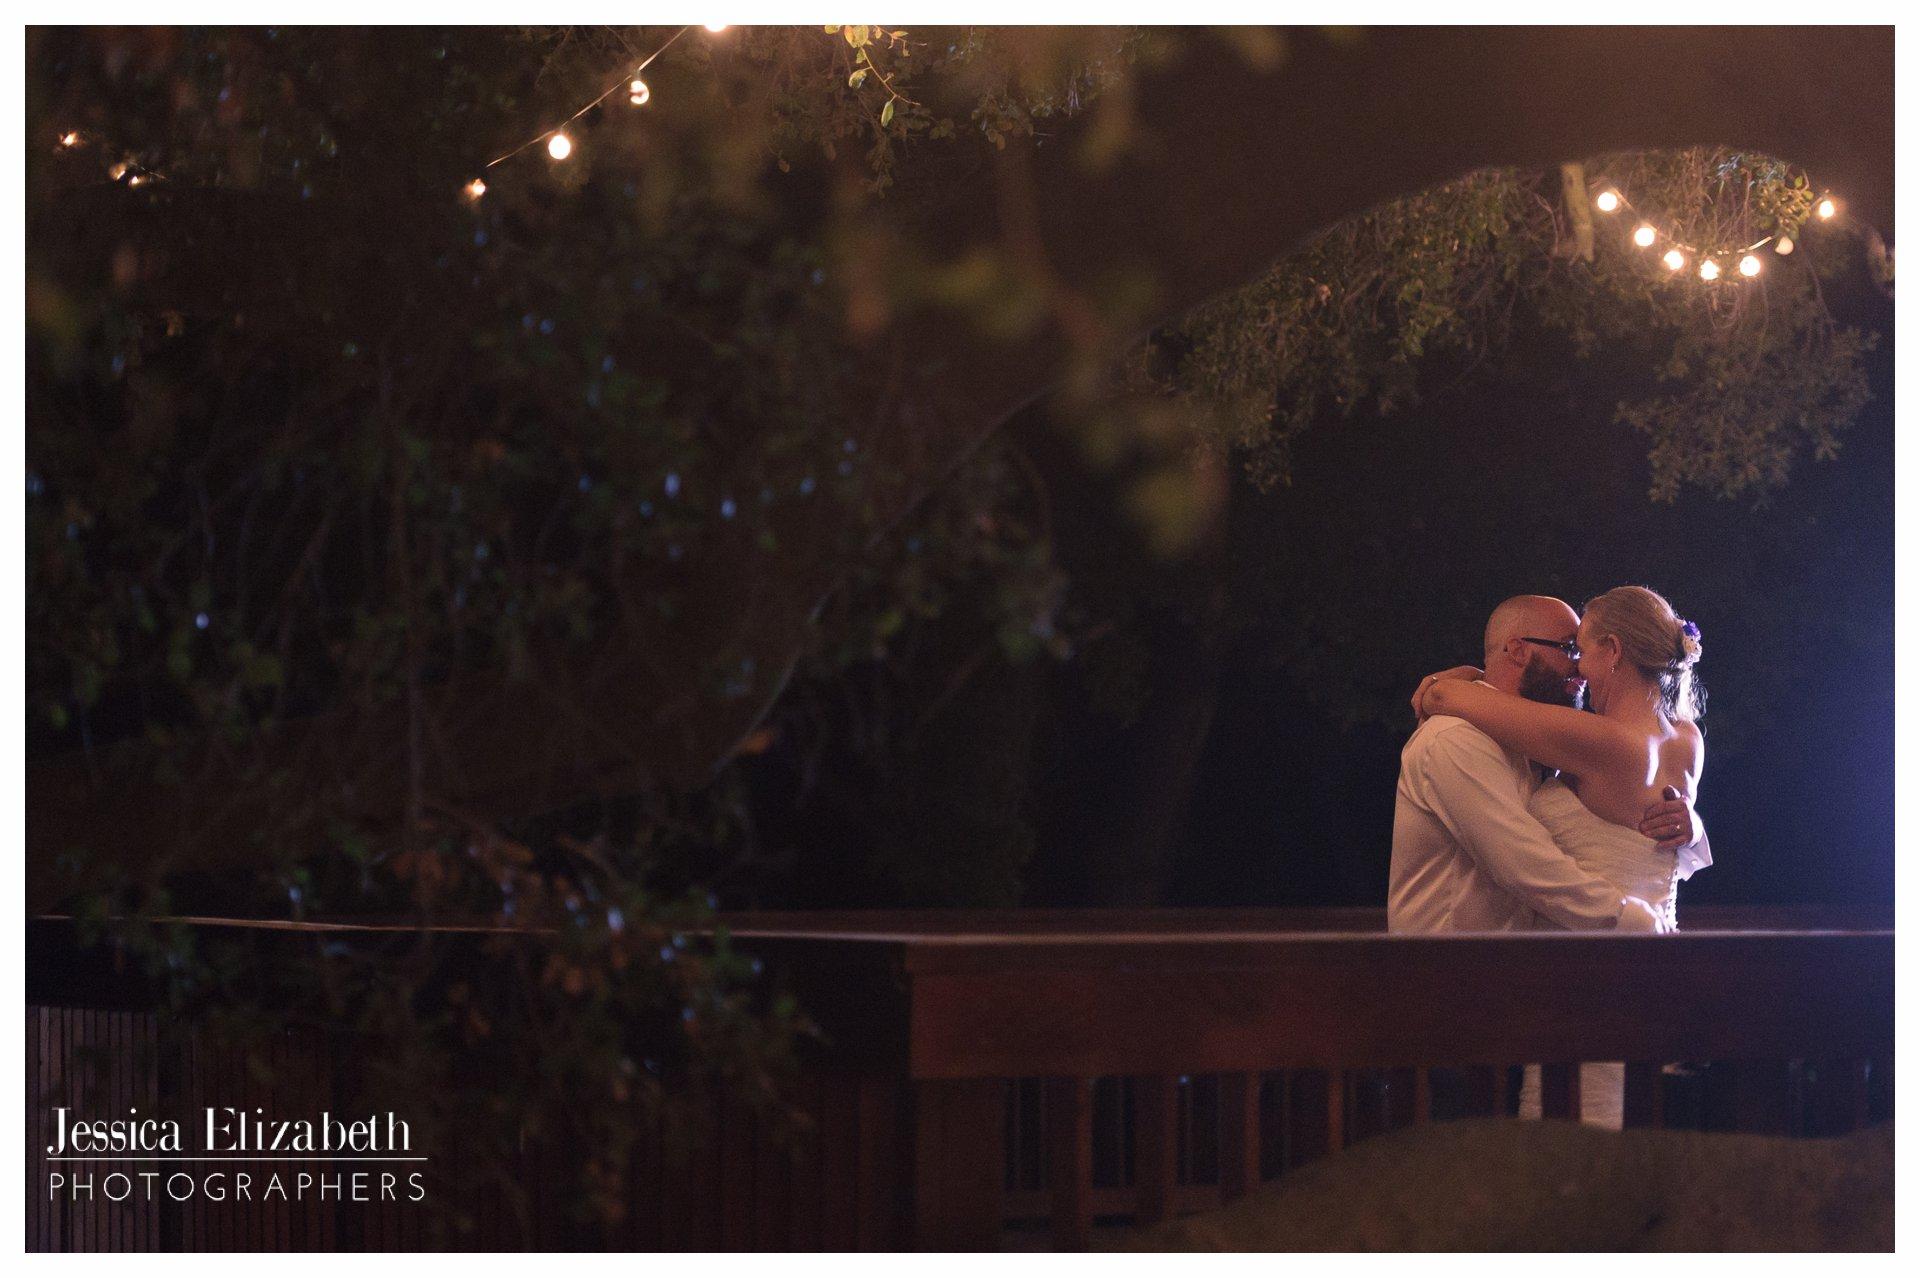 41-The-1909-Malibu-Wedding-photography-by-Jessica-Elizabeth-w.jpg